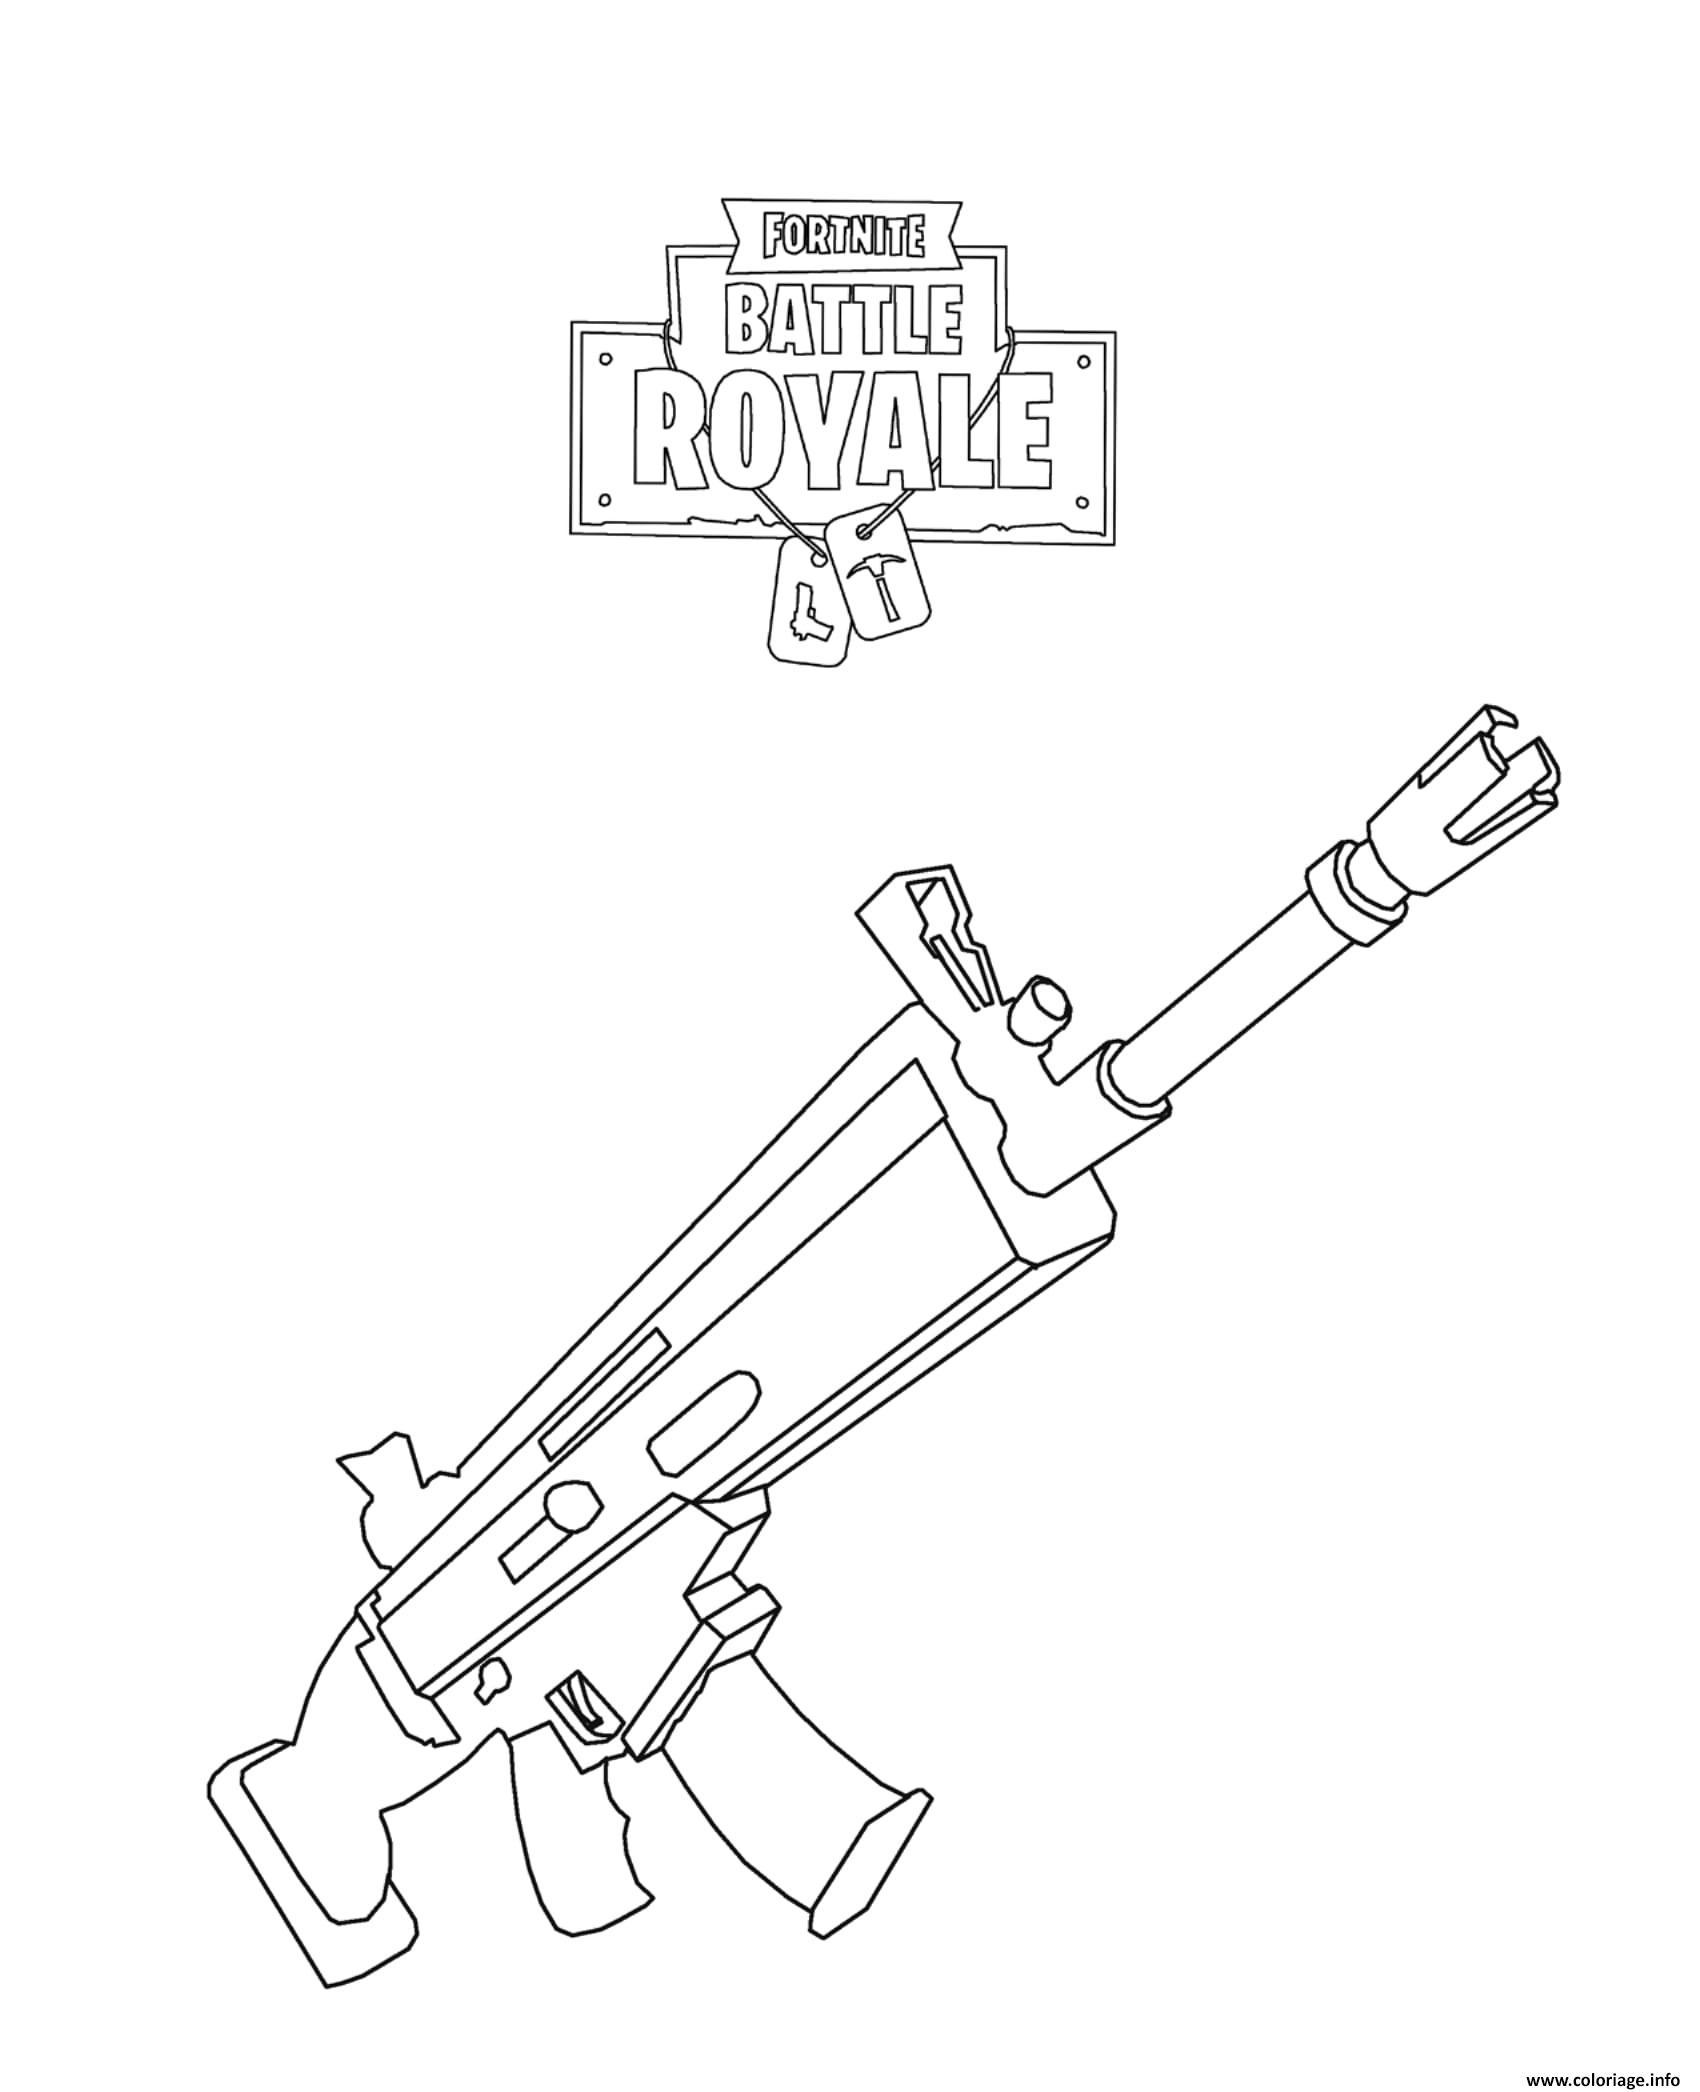 Easy Draw Fortnite Battle Royale Logo